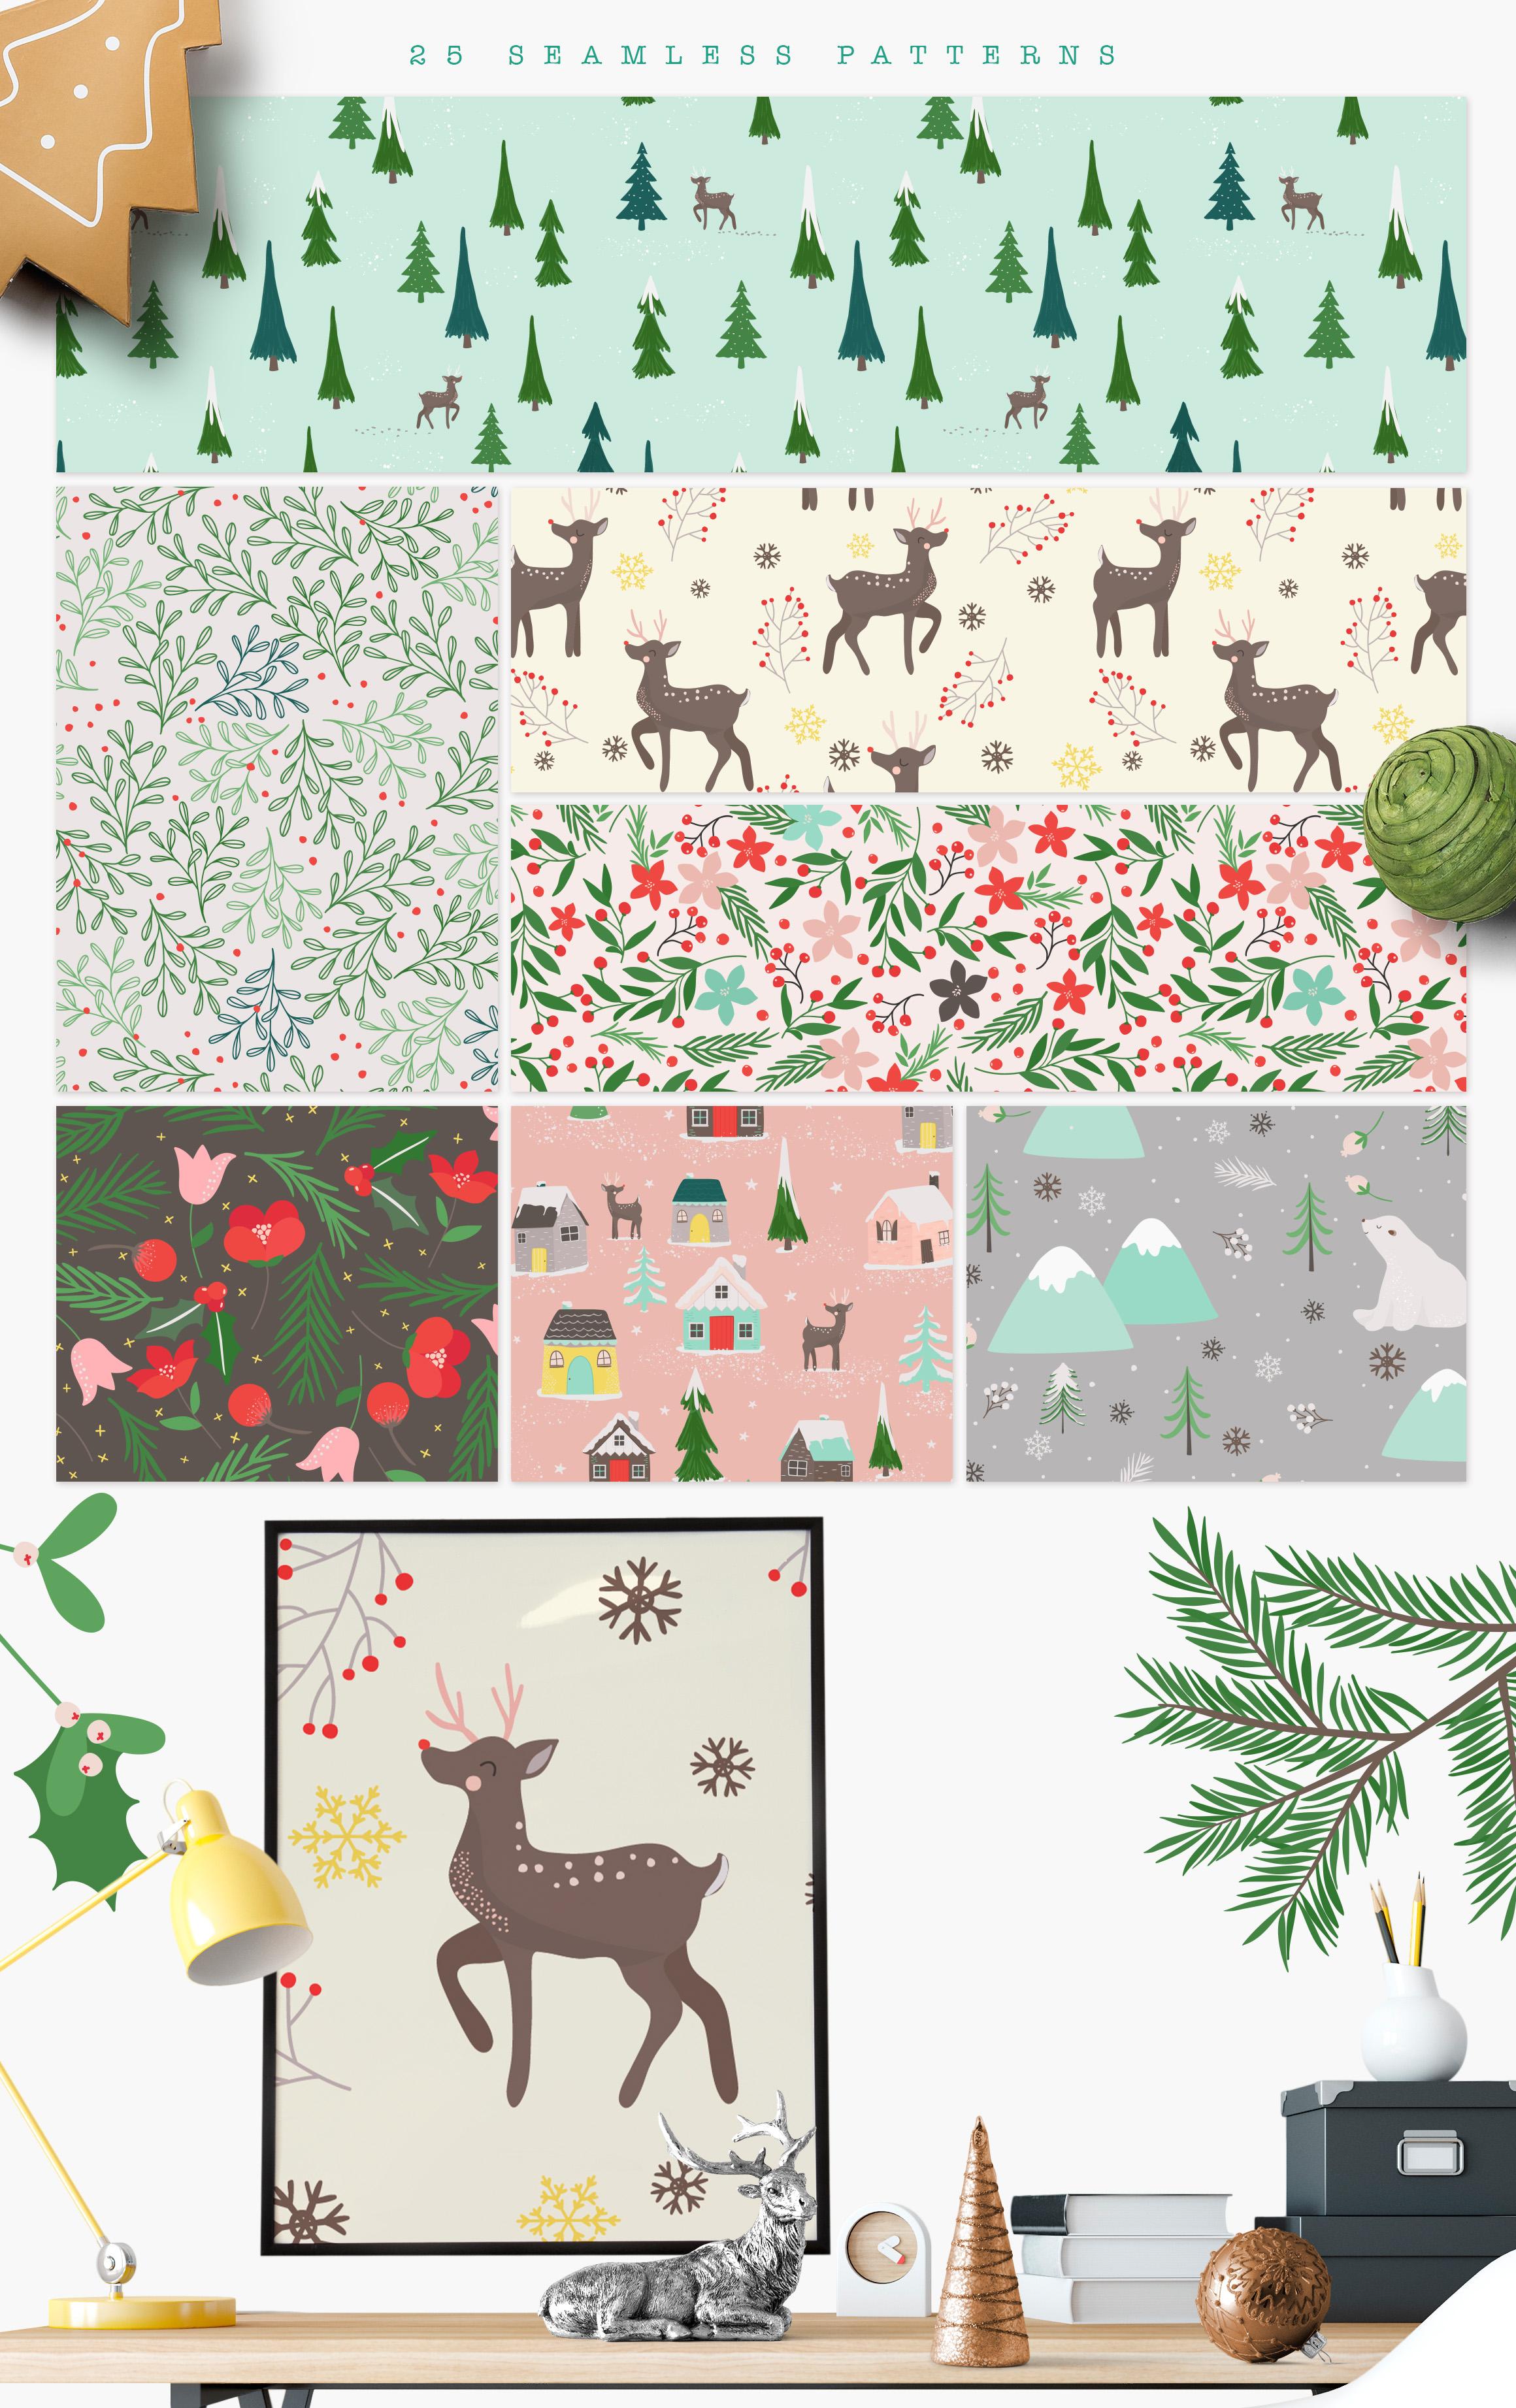 Winter Village Seamless Patterns example image 3